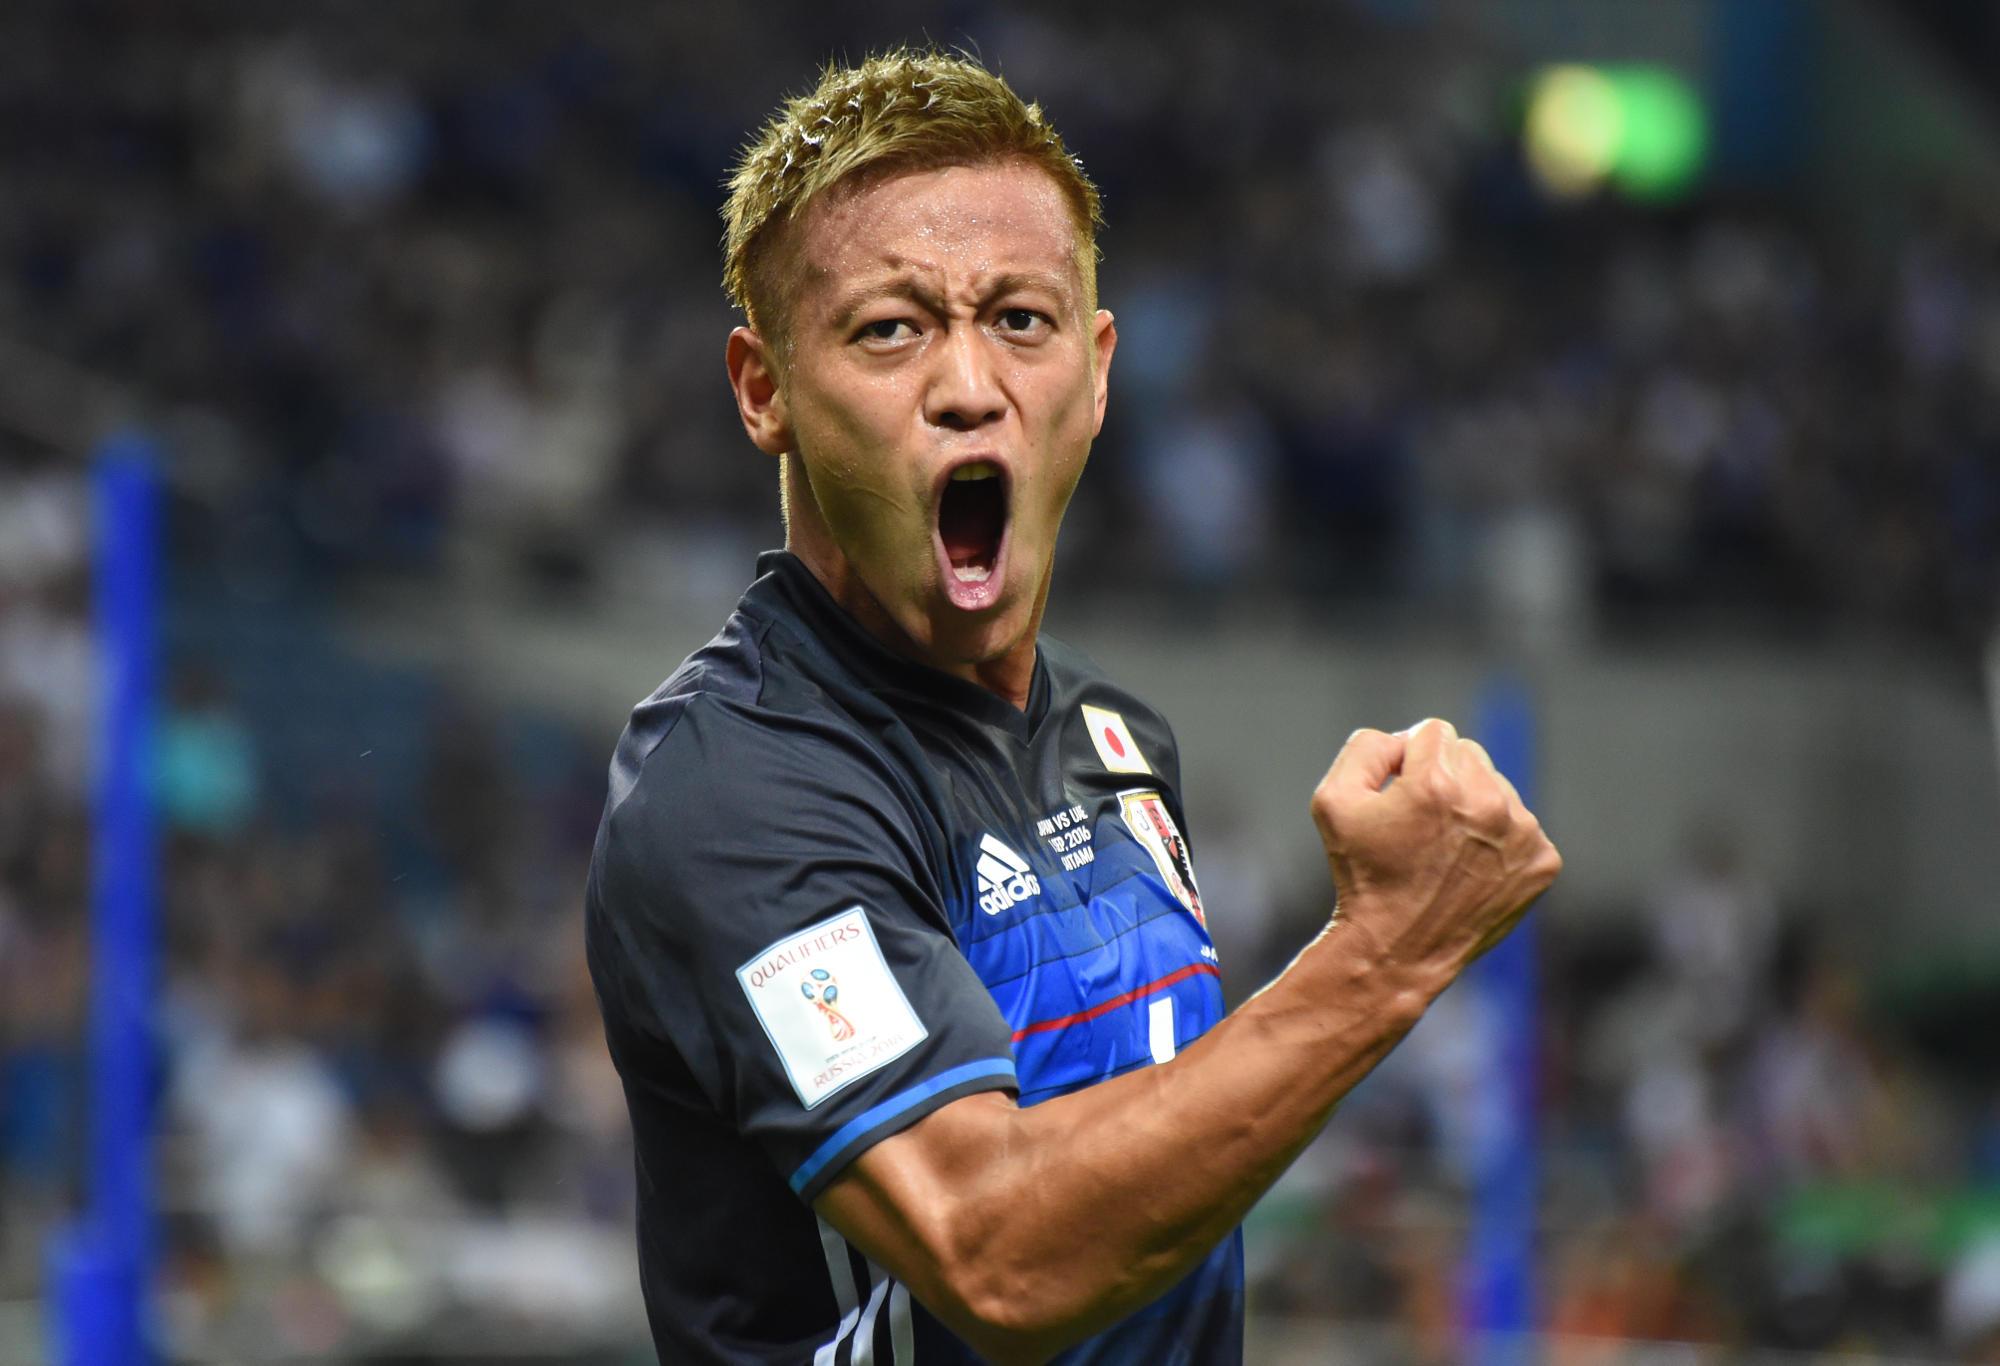 Keisuke Honda celebrates after scoring a goal